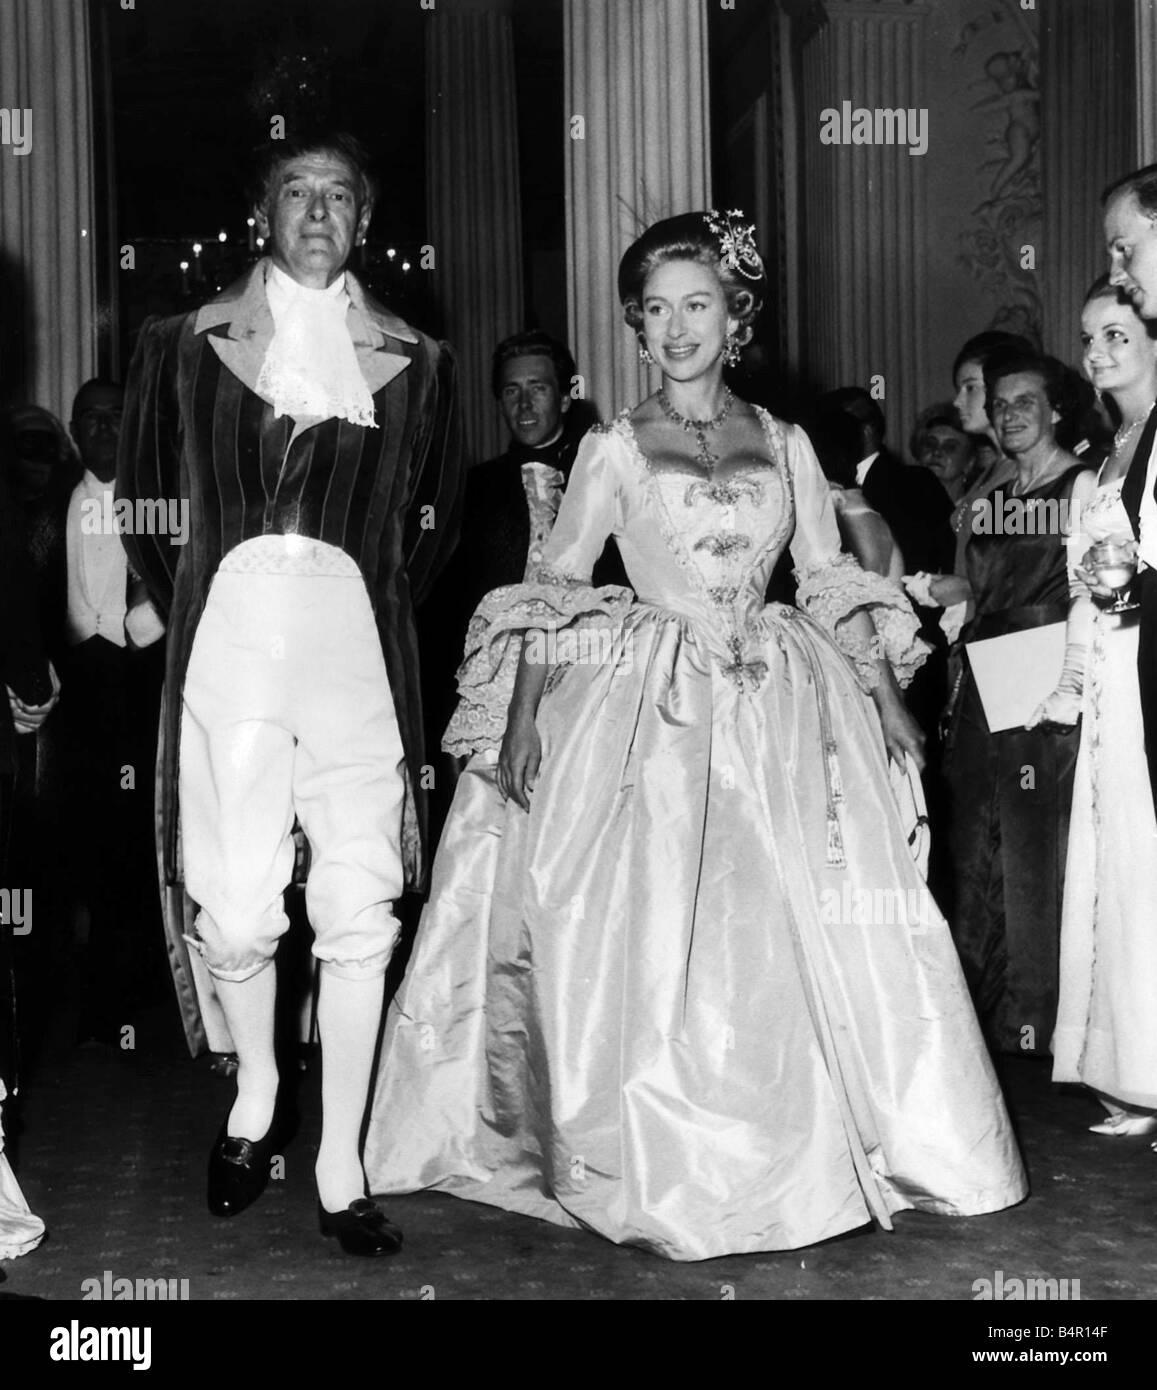 Princess Margarets Wedding >> Princess Margaret in Fancy dress for the Georgian Ball Stock Photo: 20174799 - Alamy